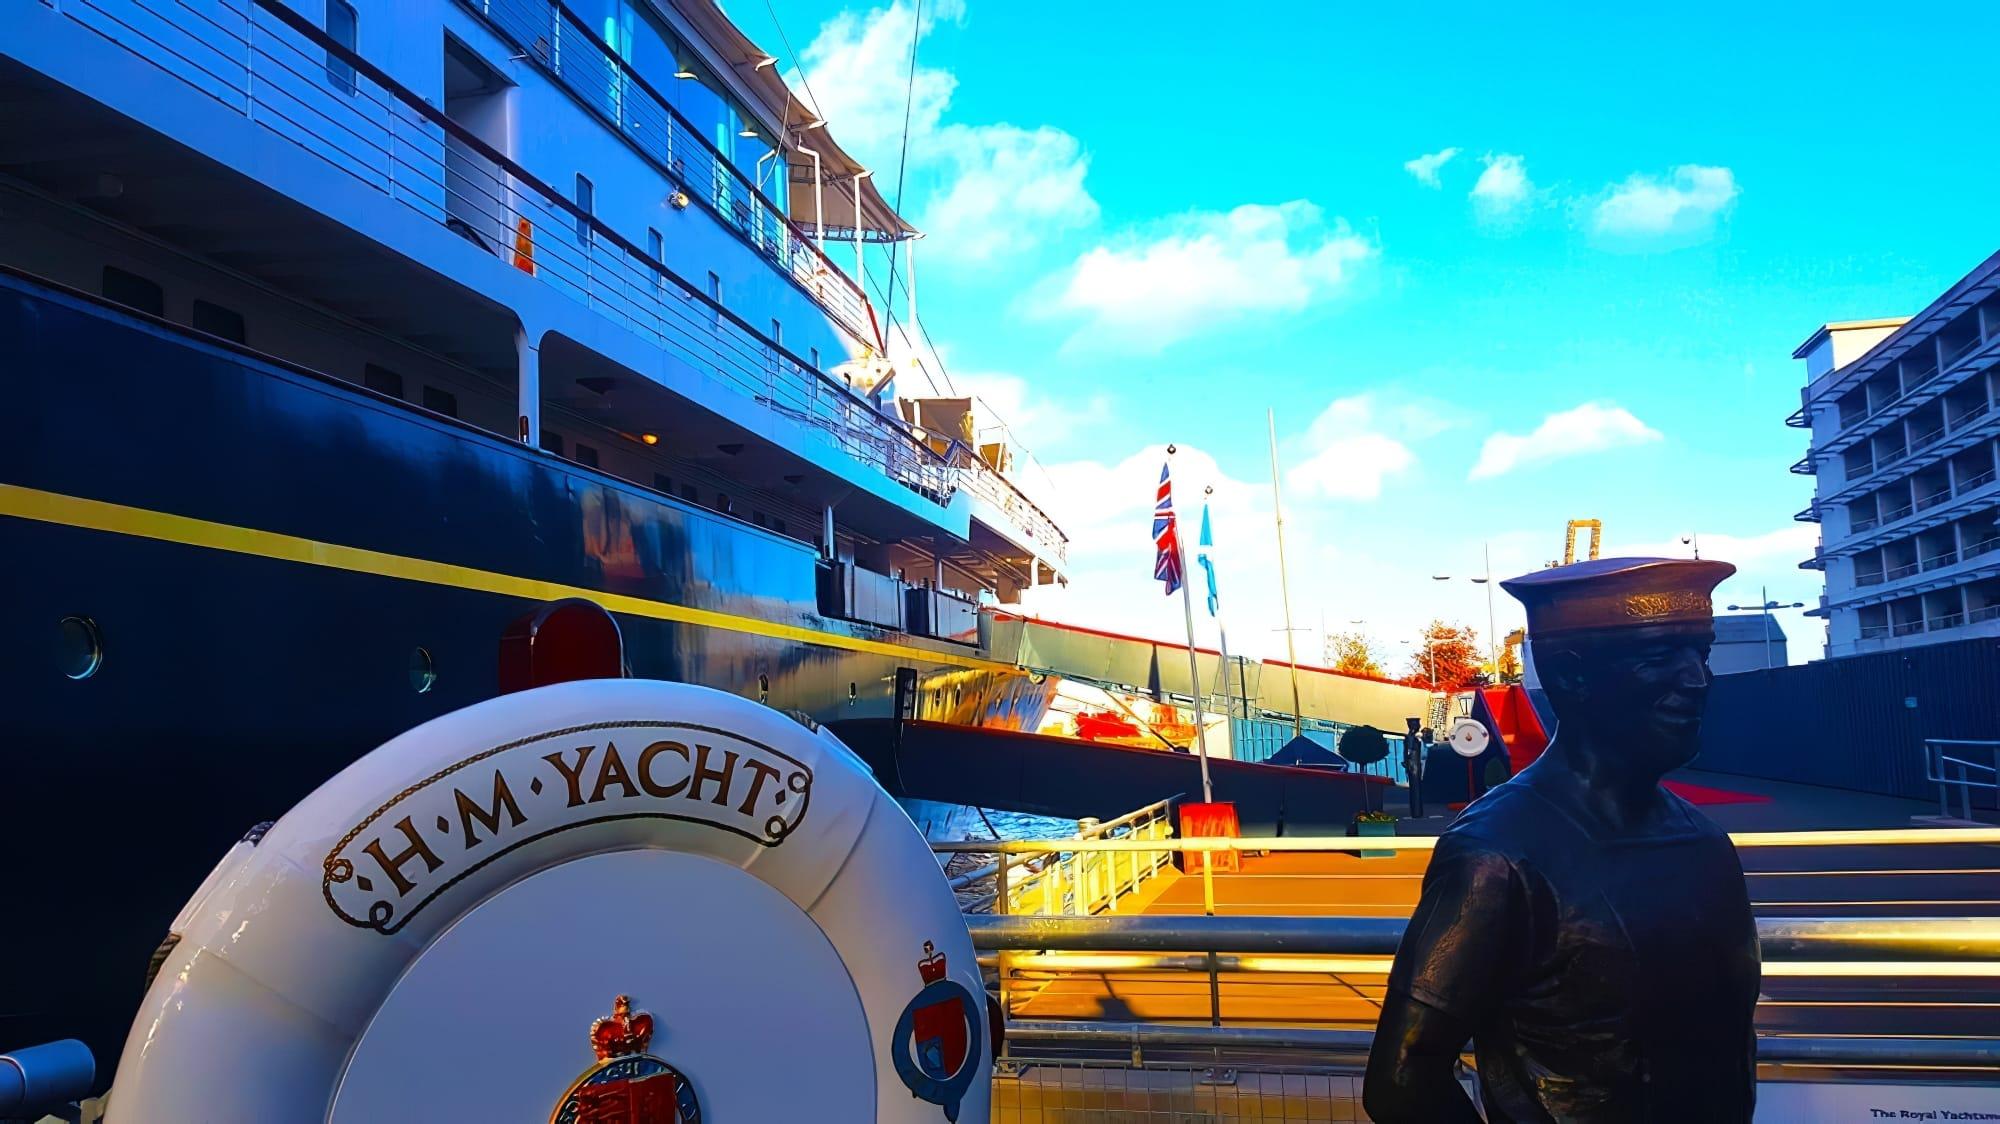 la yacht royal britannia